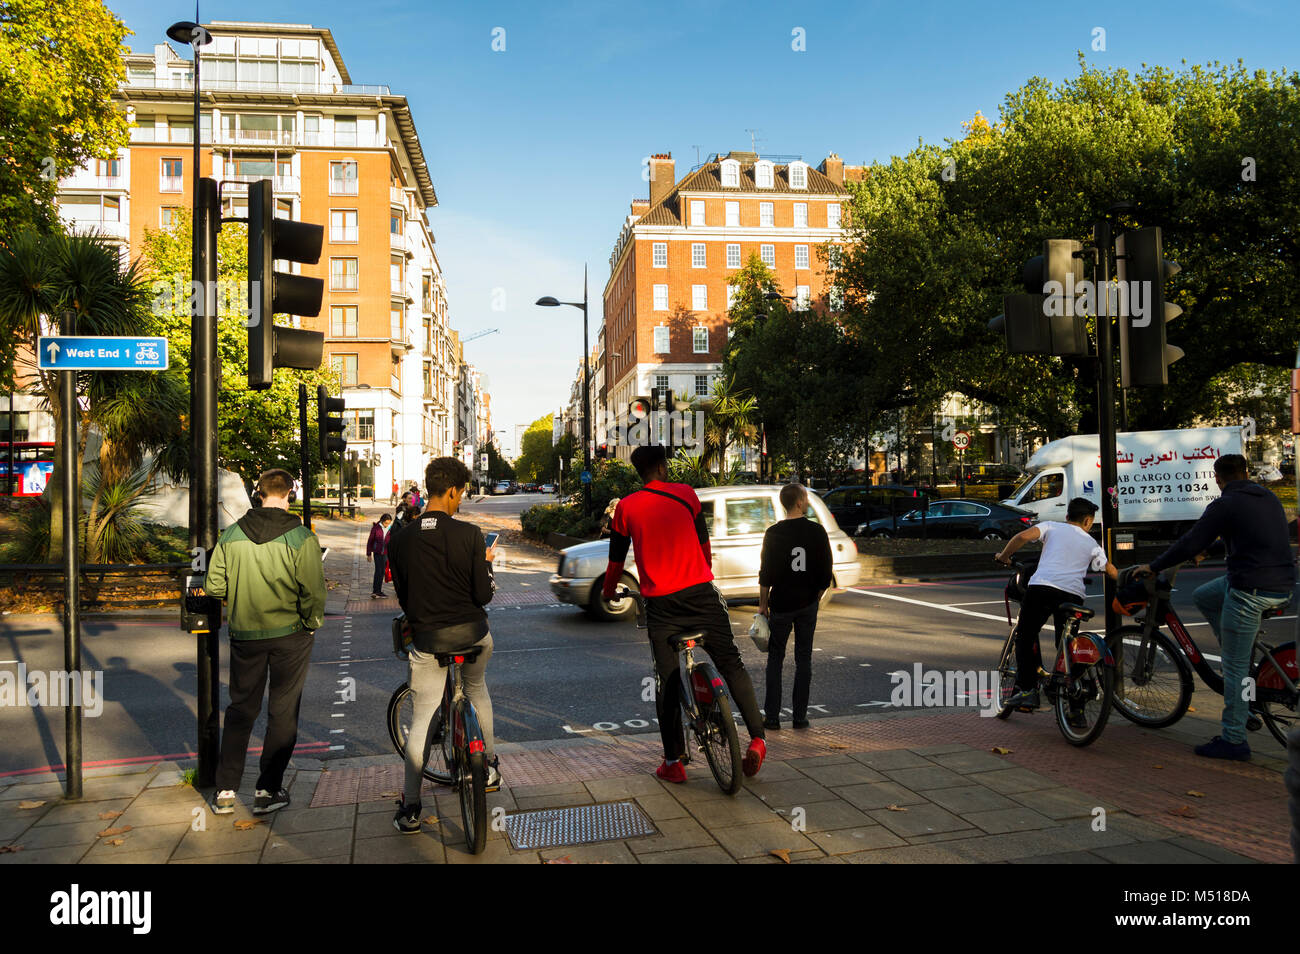 Cycle Fashion London Stock Photos & Cycle Fashion London ...